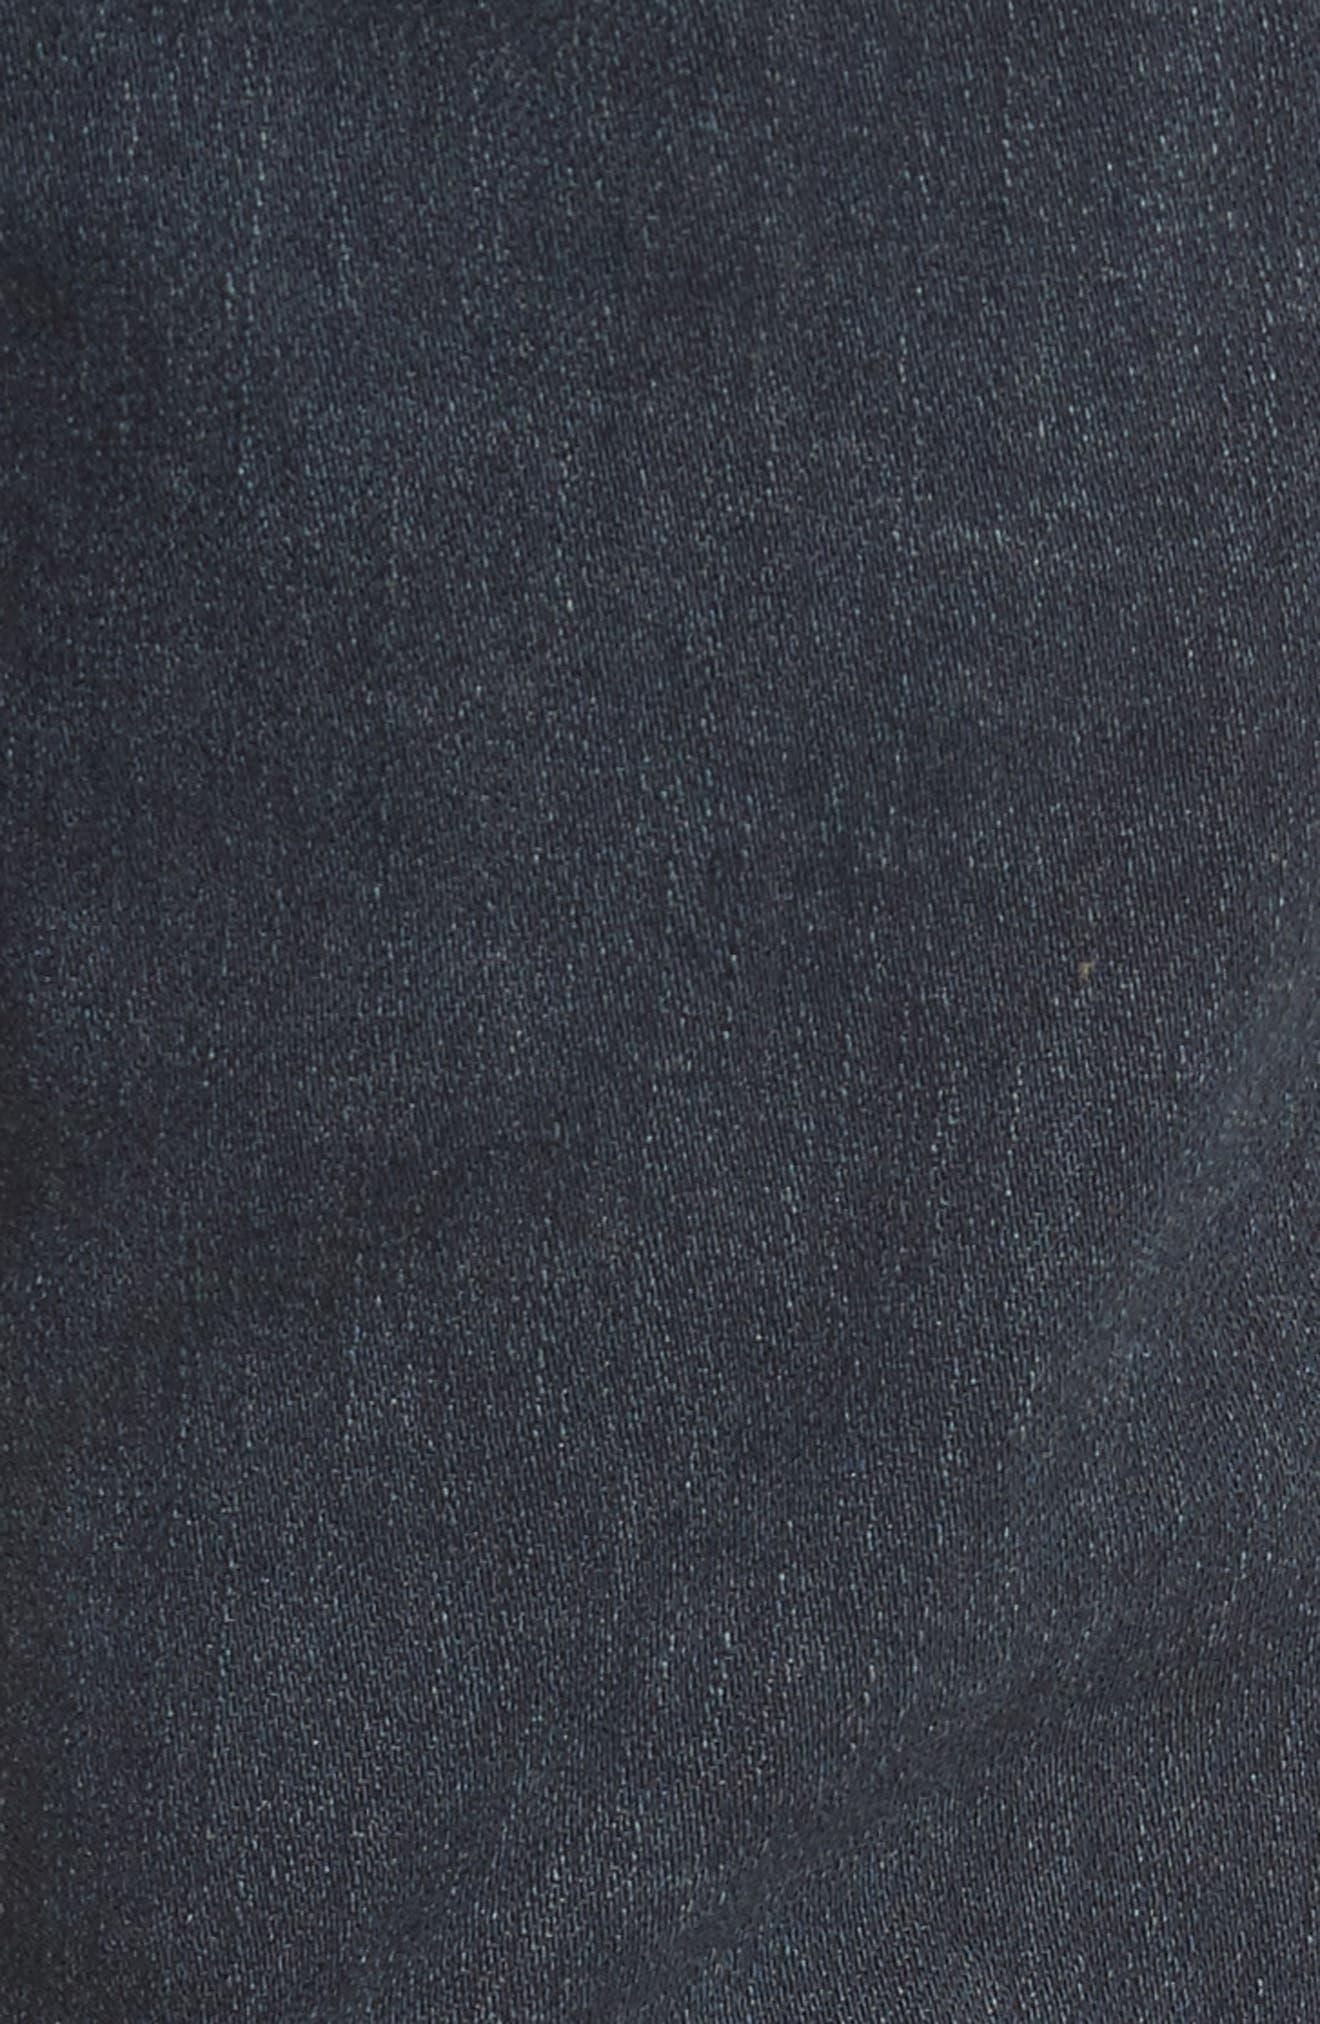 Dylan Skinny Jeans,                             Alternate thumbnail 5, color,                             019